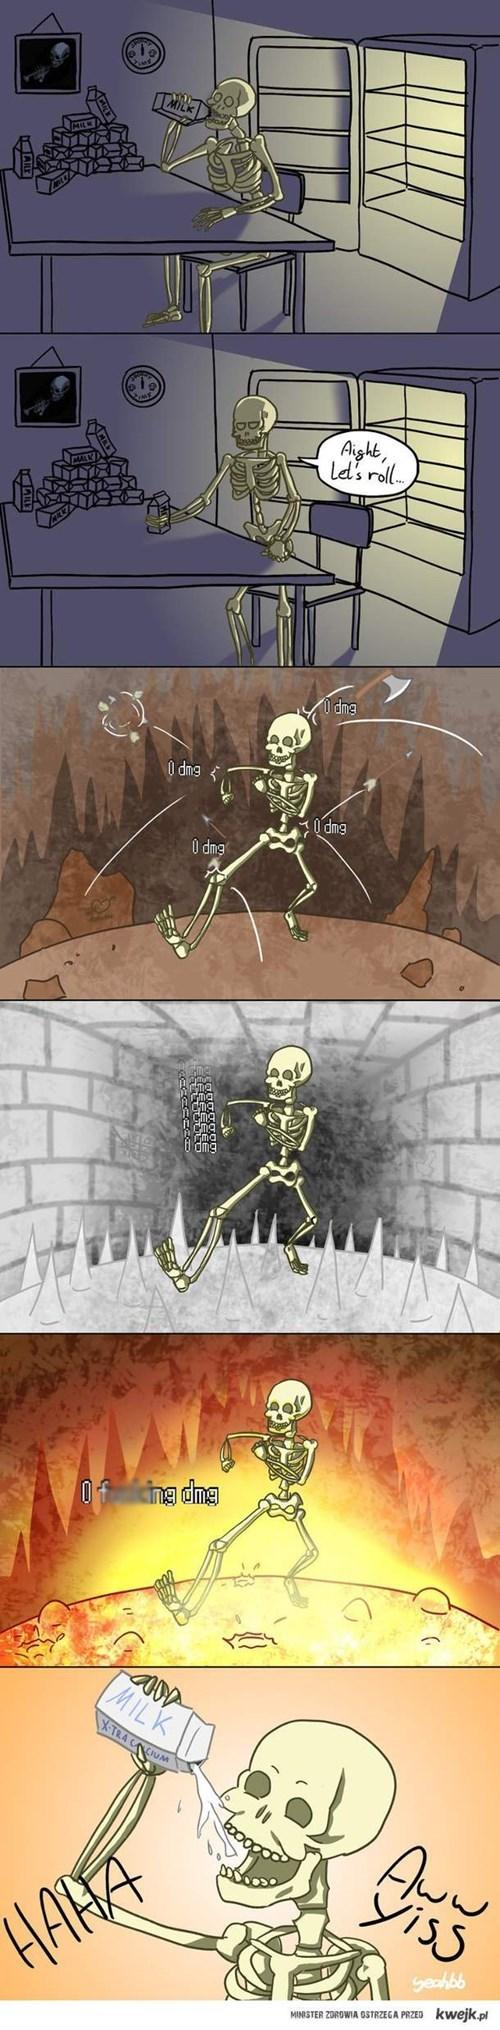 milk tough guy skeletons web comics - 8278358016